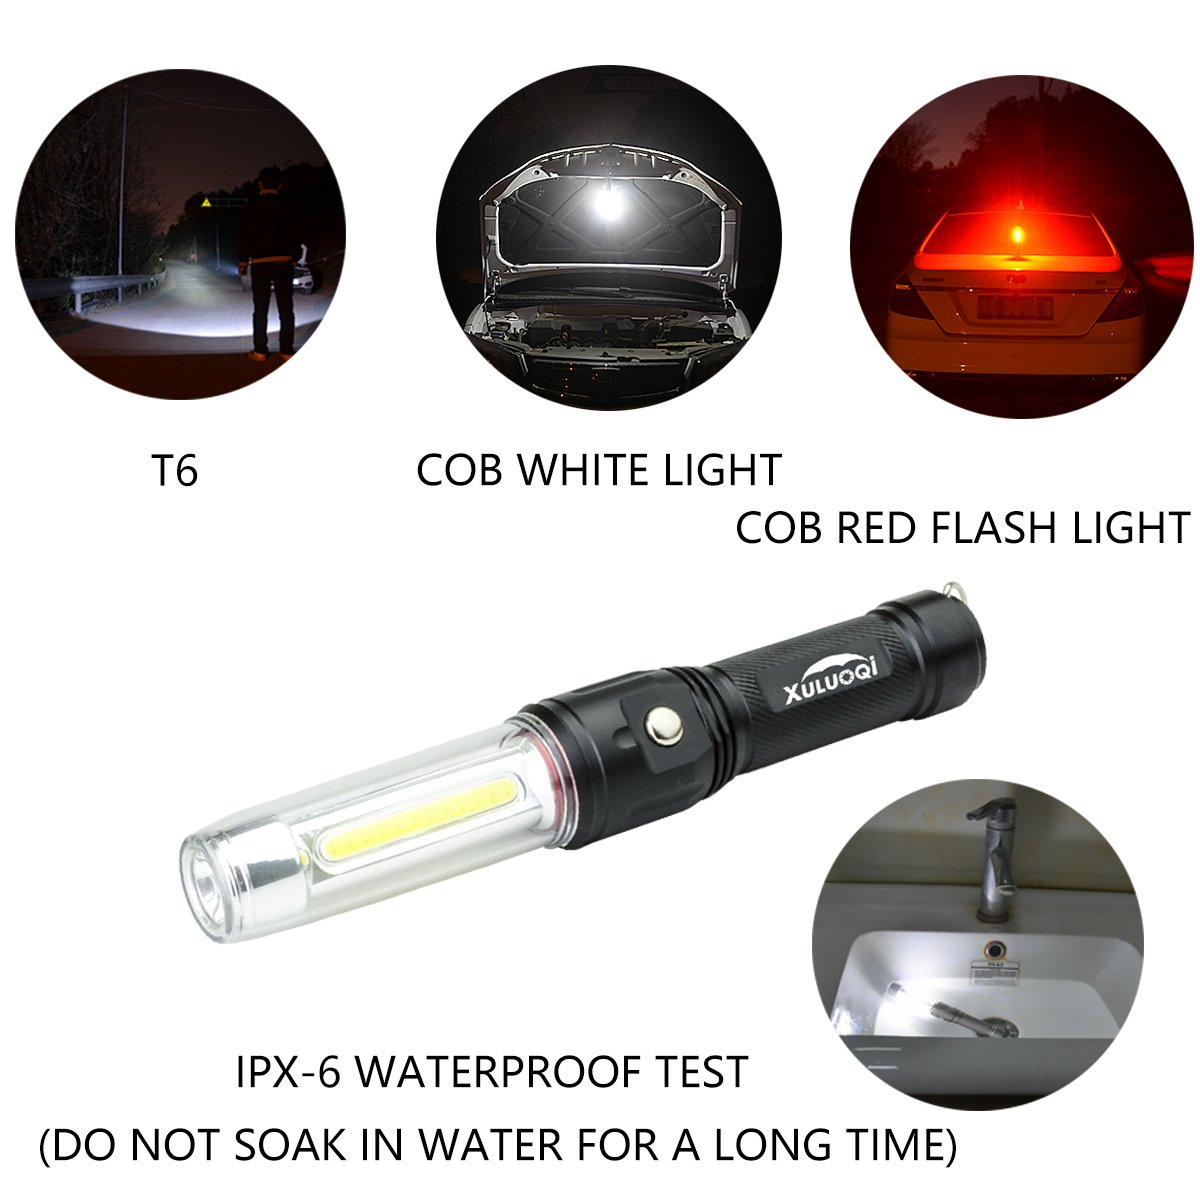 XULUOQI Work Light Super Bright LED Flashlight, Multi-function Flashlight 3 in 1 rechargeable Work Light - 900 Lumens Handheld Emergency Light with Magnetic Base Safety Roadside Light Car Maintenance by XULUOQI (Image #2)